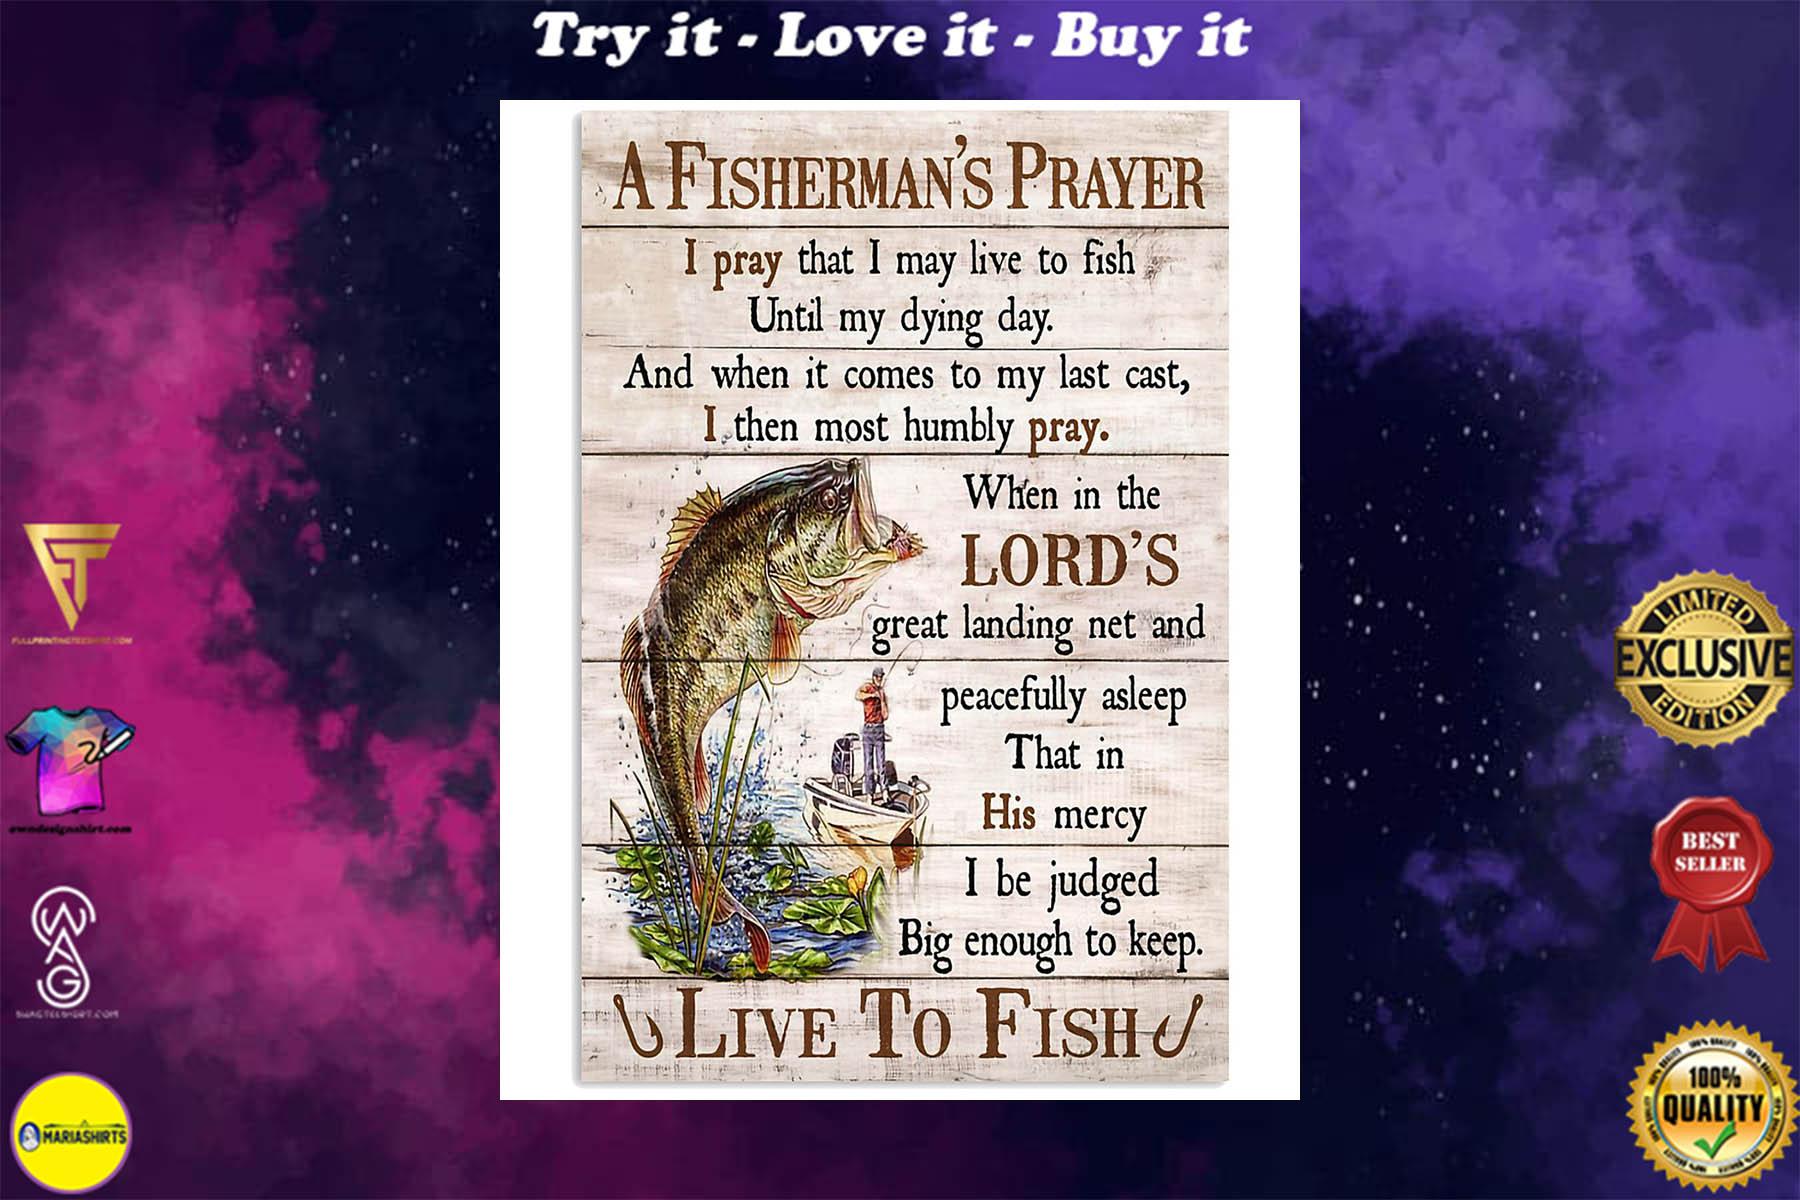 fishing a fishermans prayer i pray that i may live to fish poster